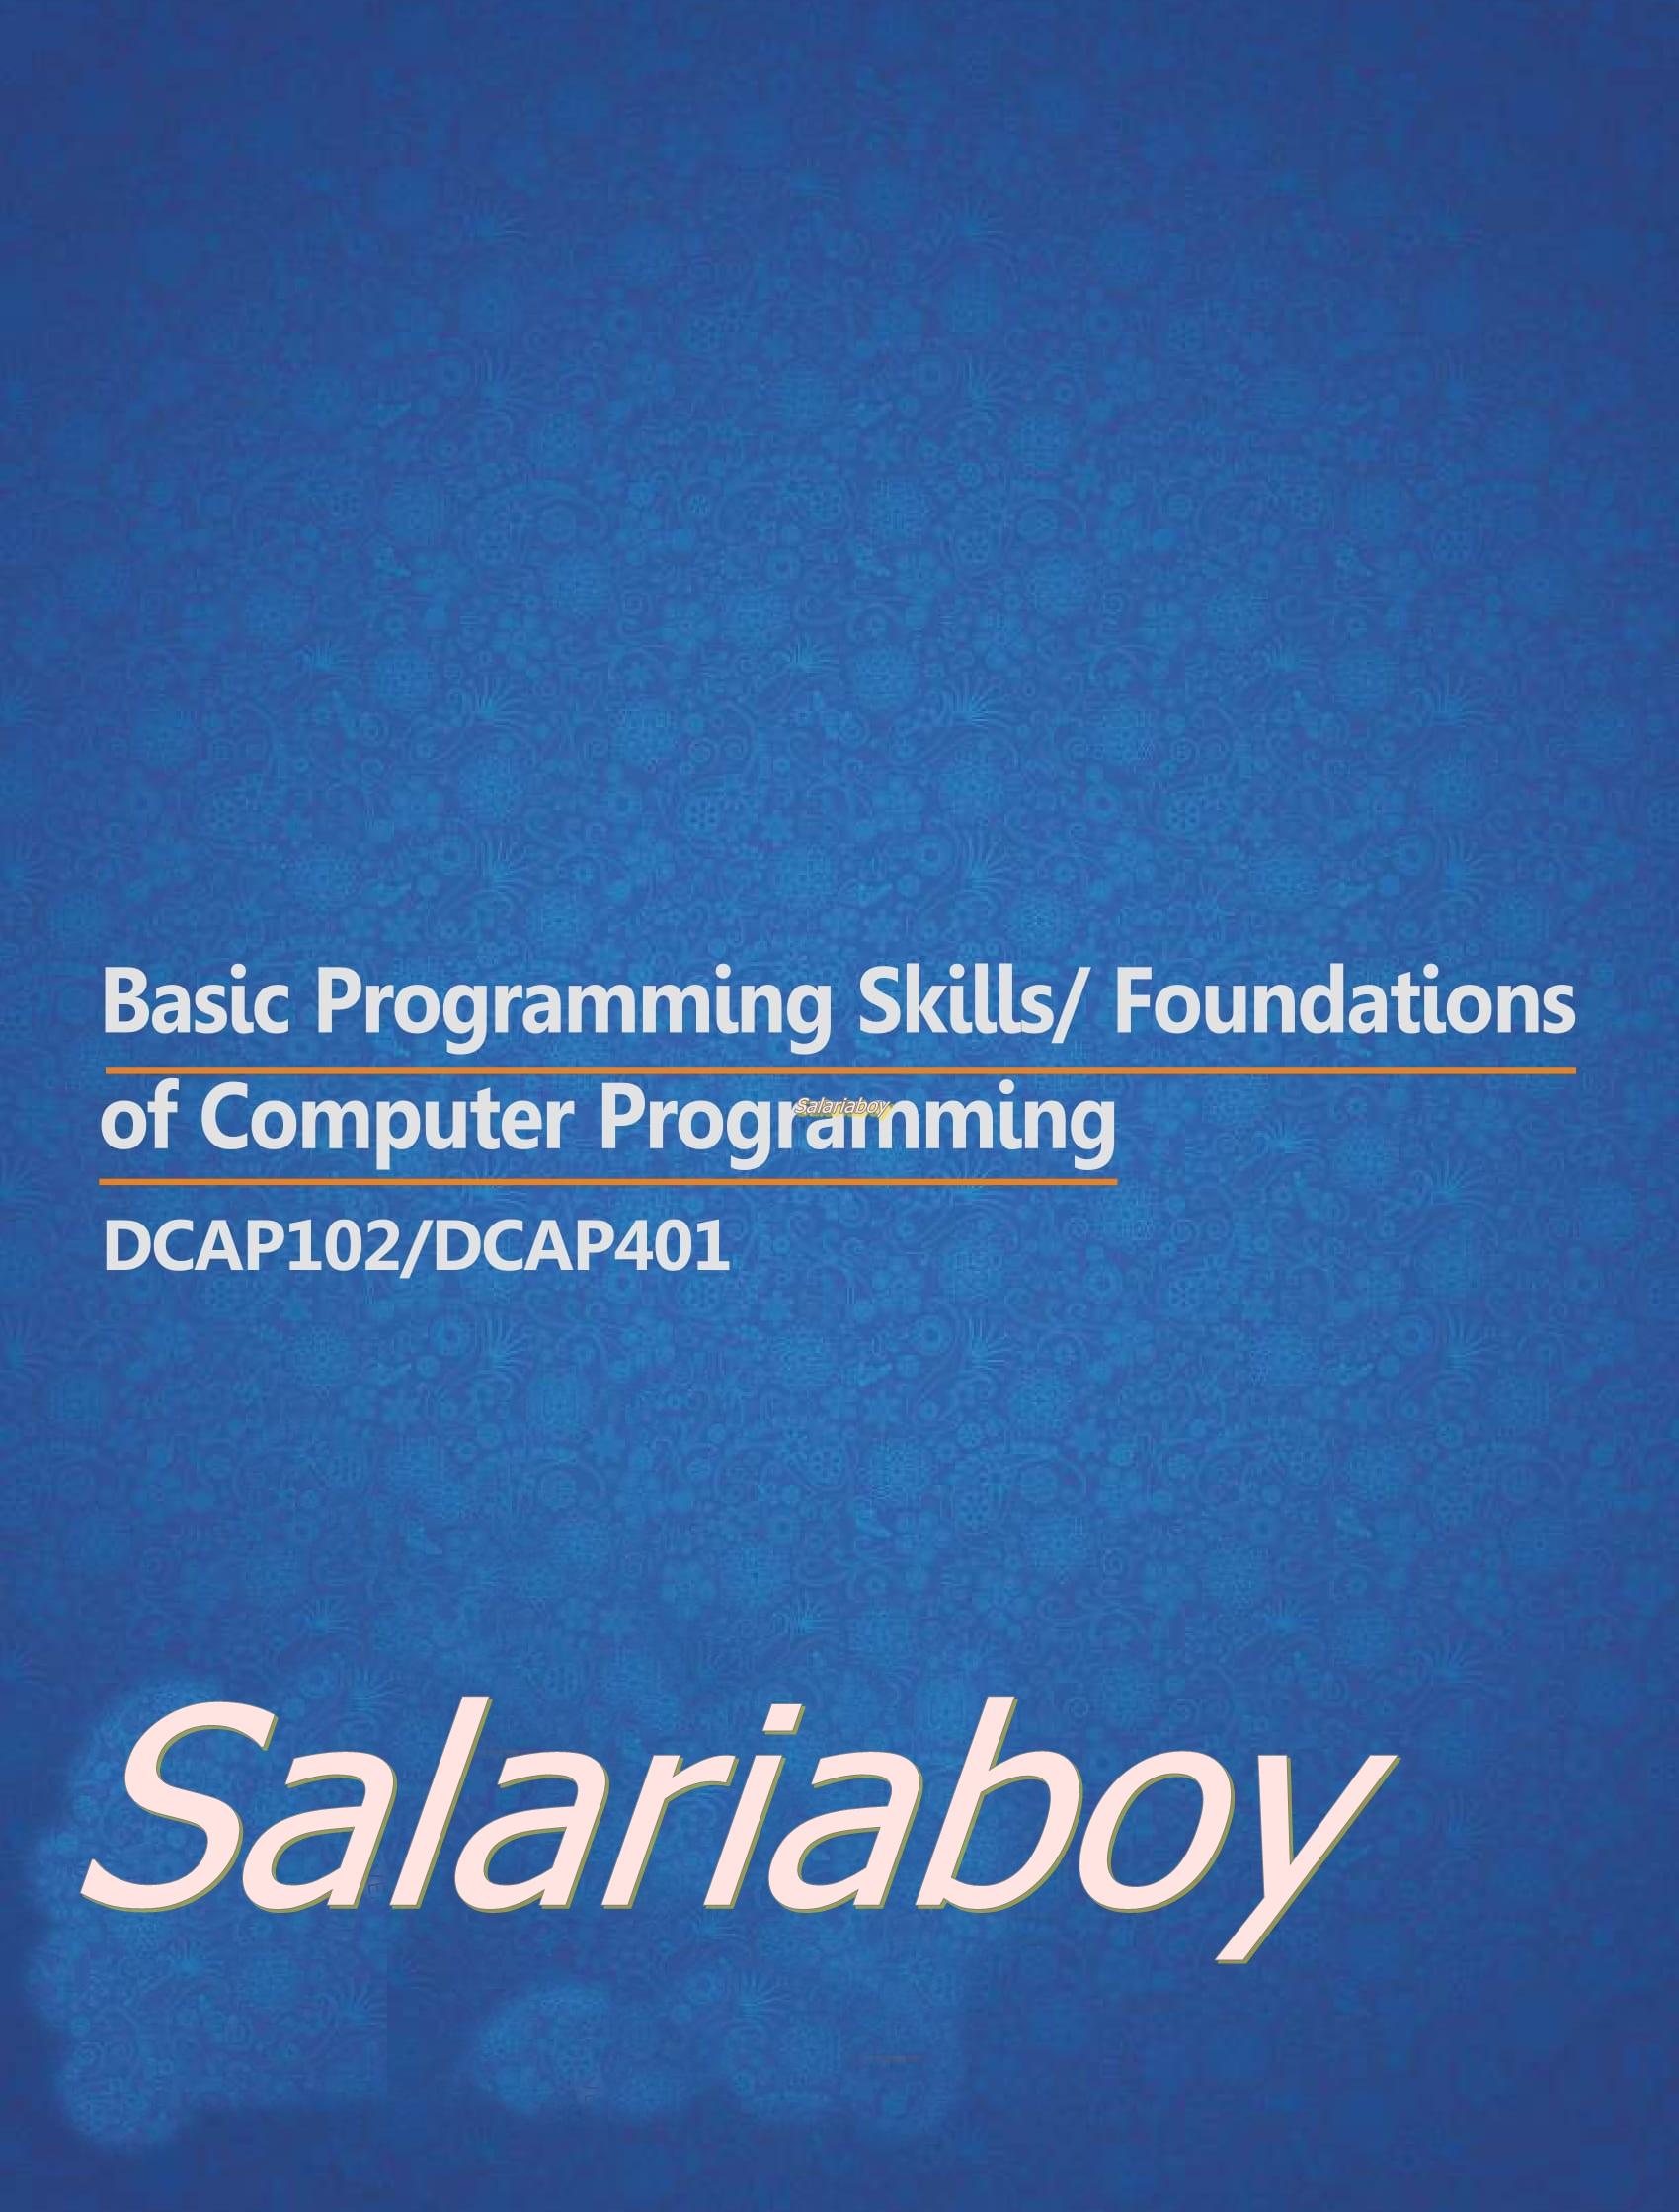 Chapter 1 (BASIC PROGRAMMING SKILLS) | Ask Anku